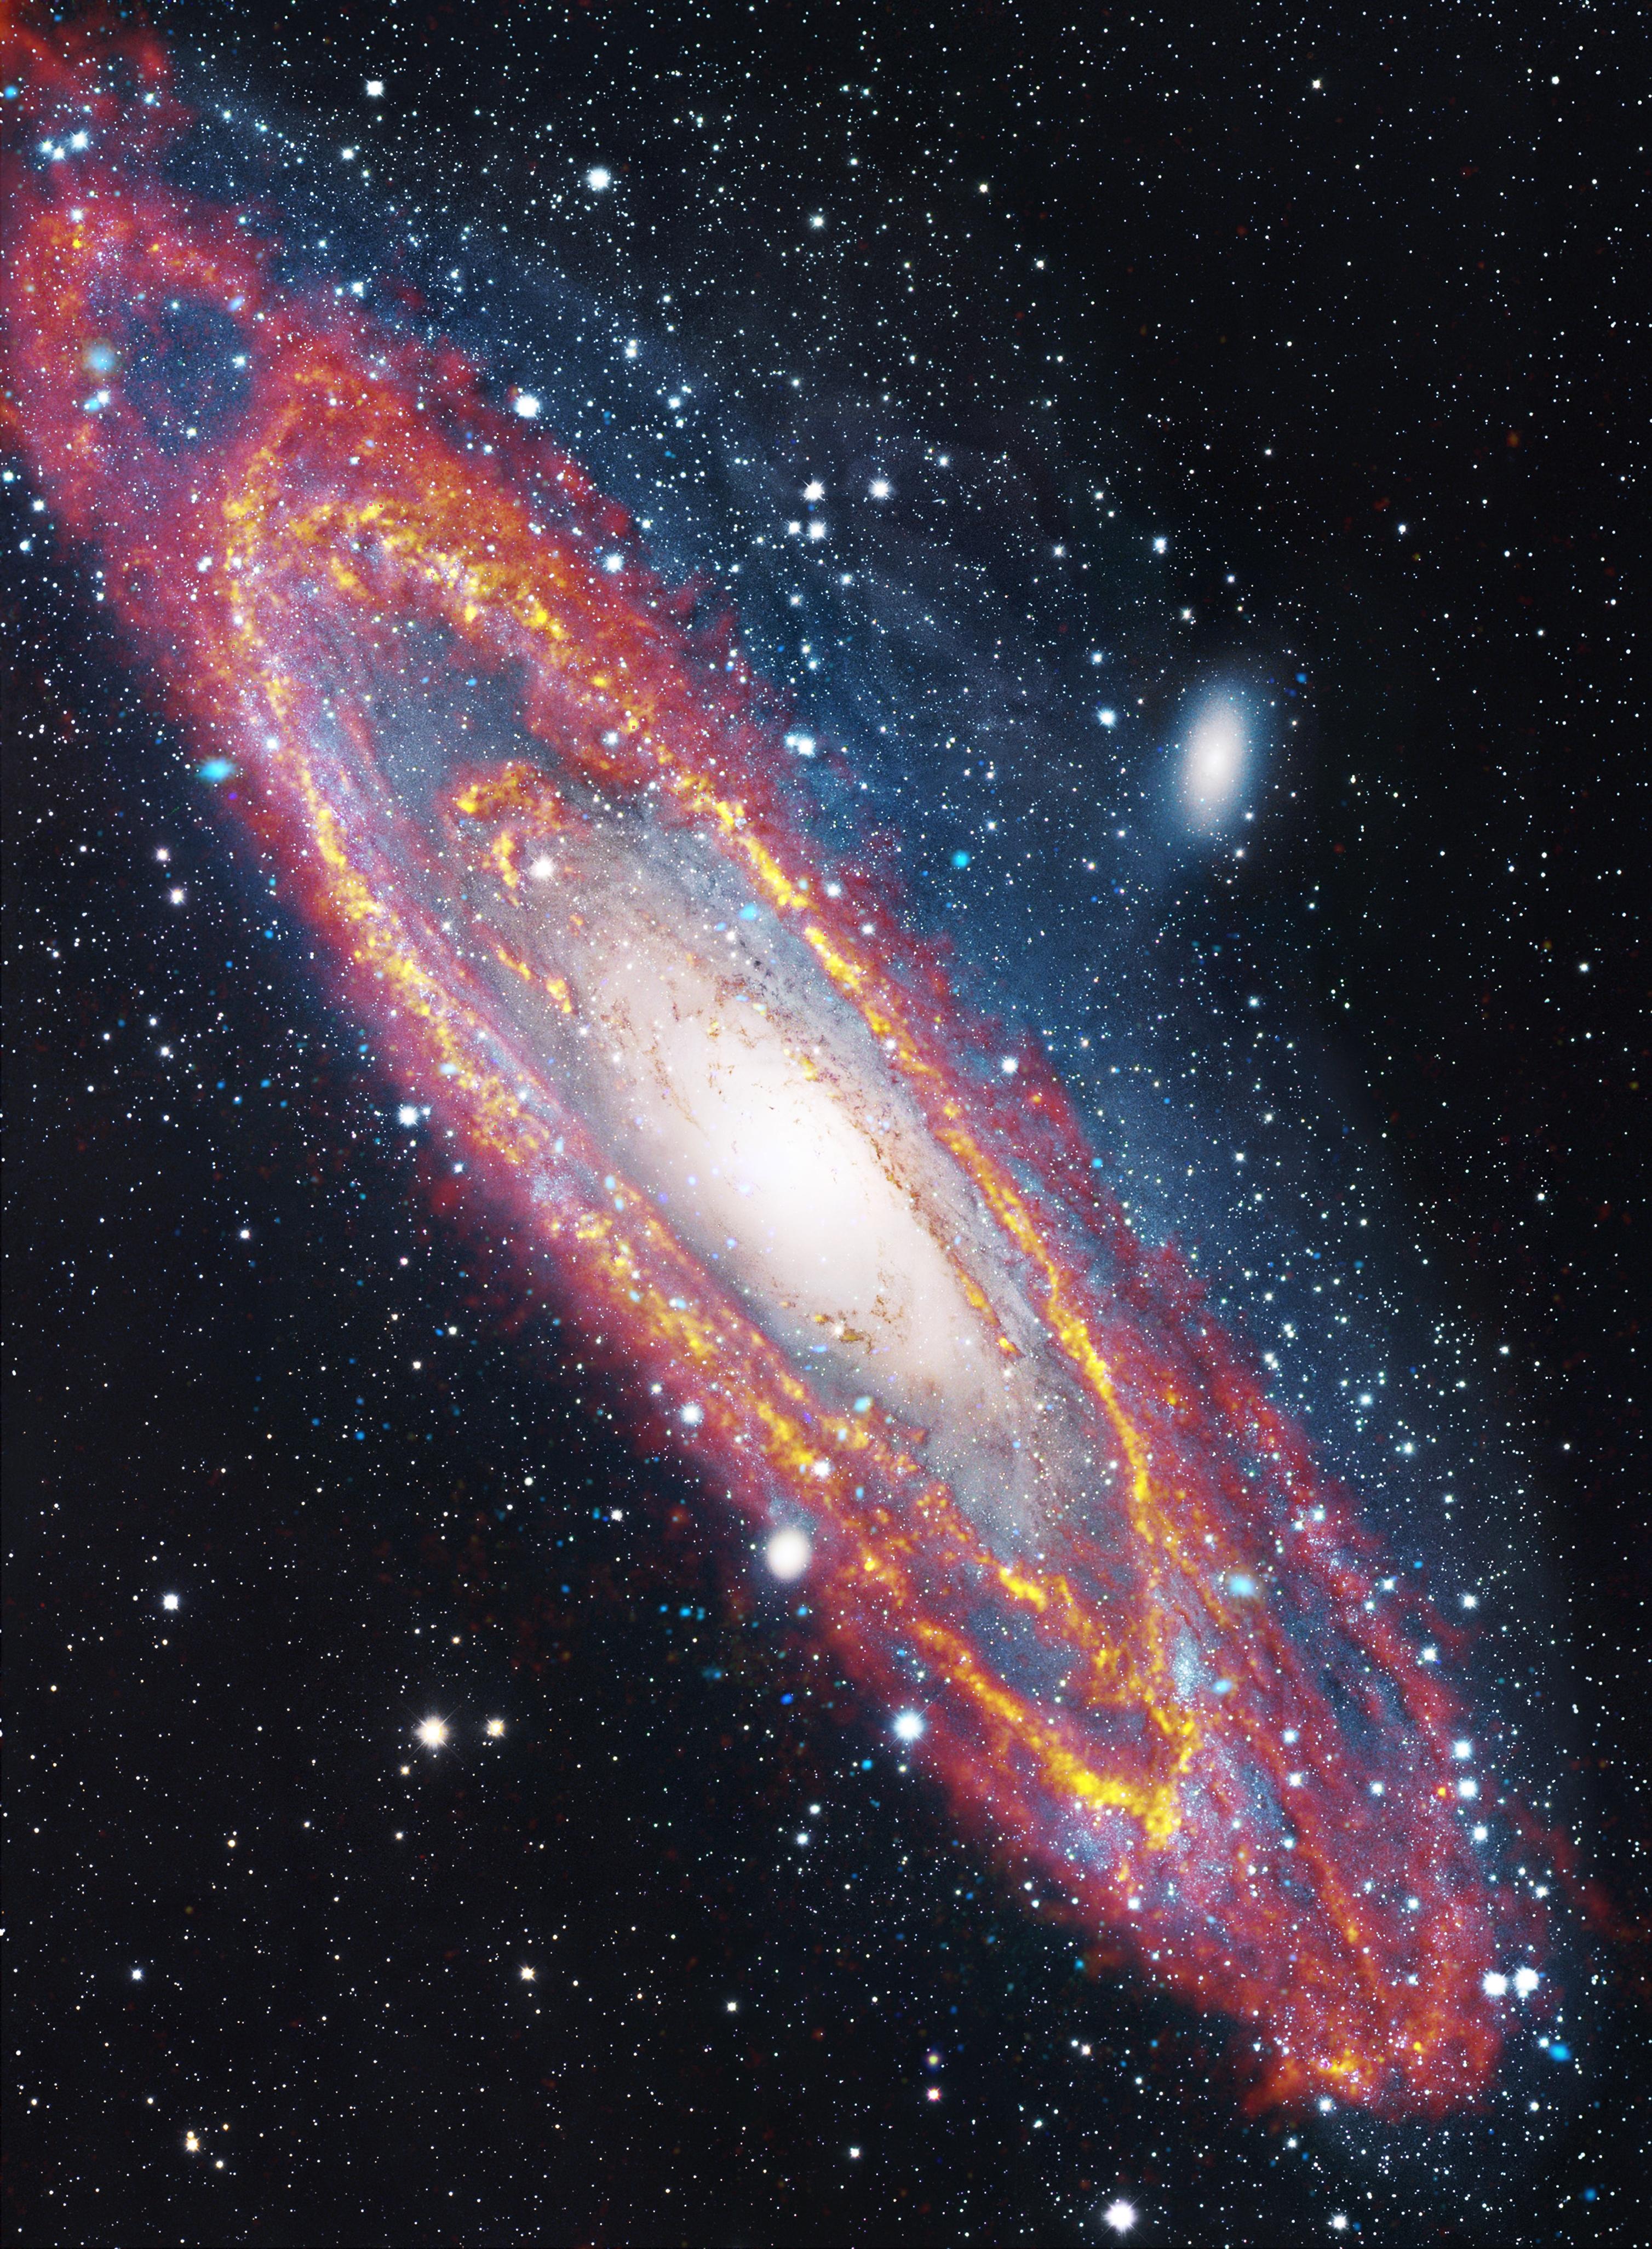 1567216933099-M31_XMM_HERSCHEL_OPTICAL.jpg